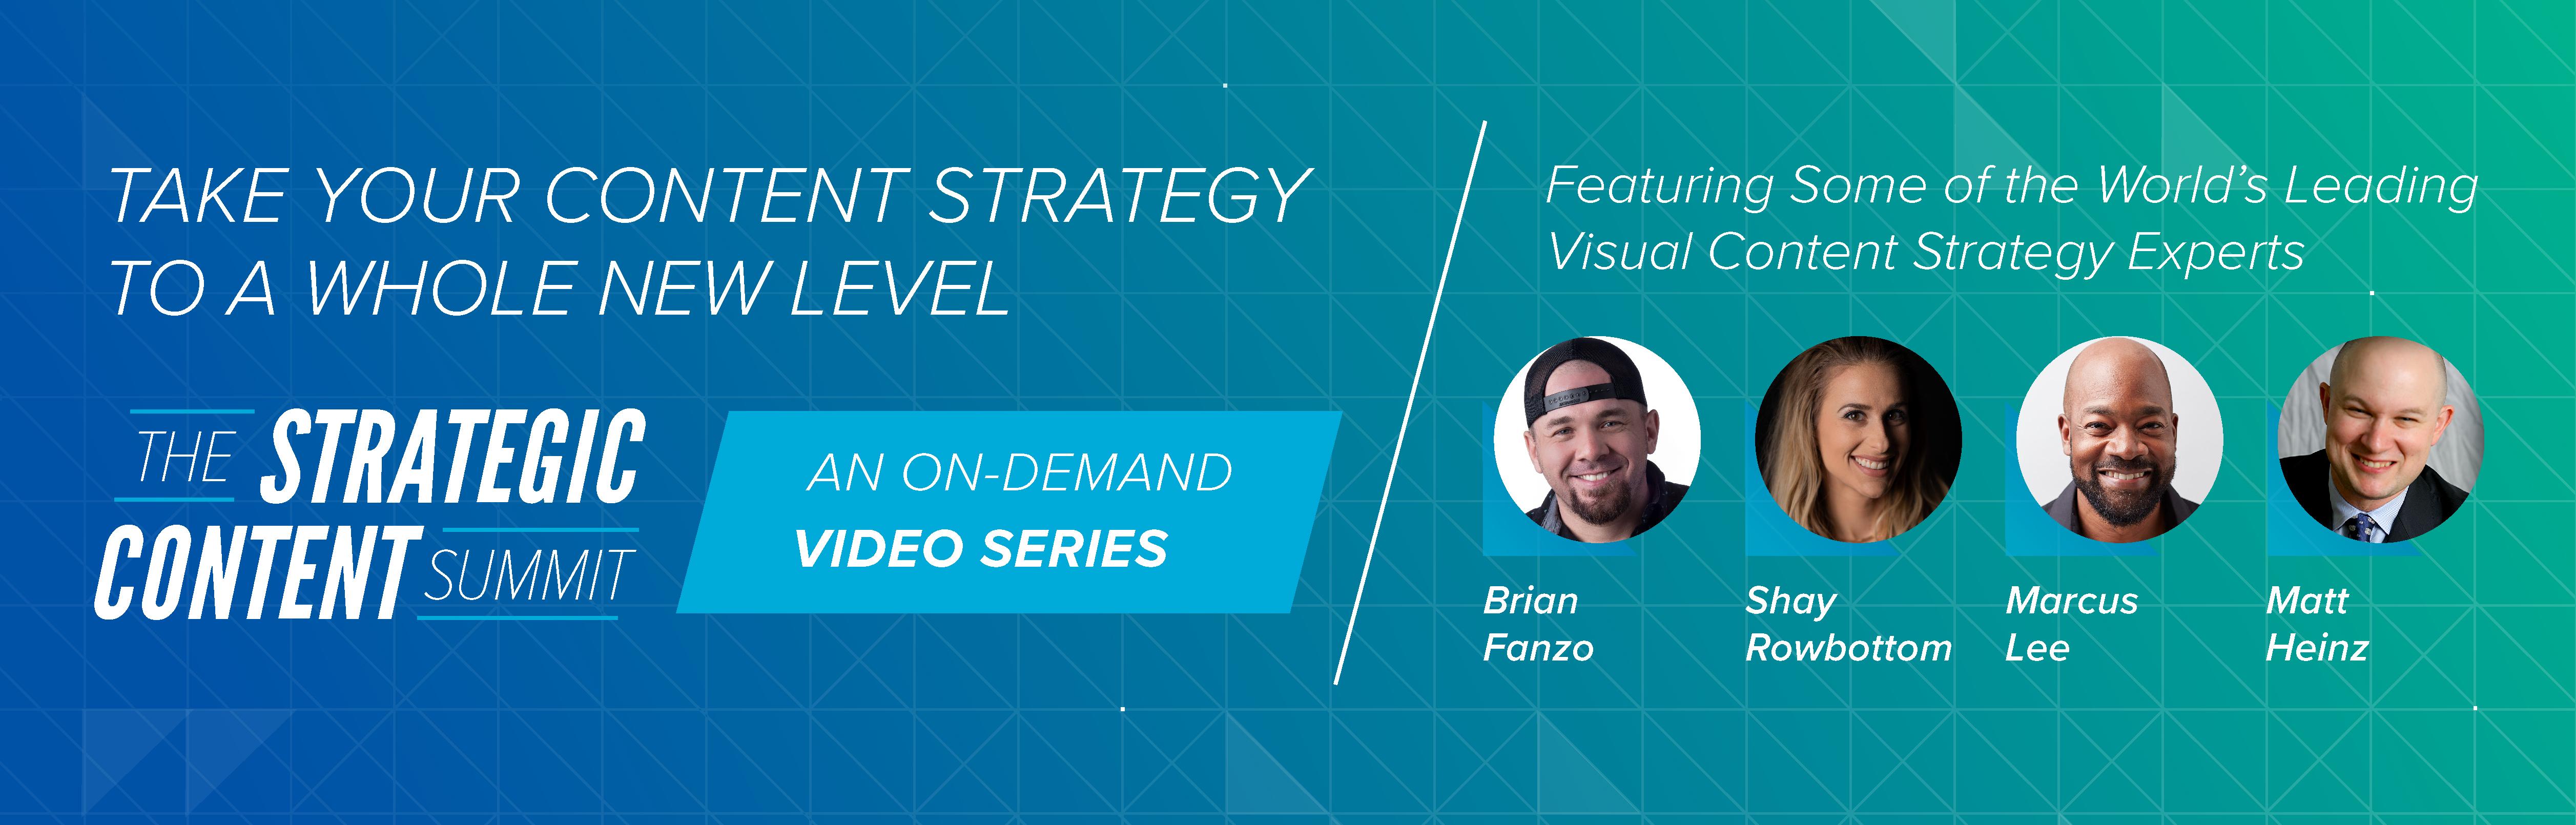 Strategic Content Summit webinar series teaser with guest speaker photos